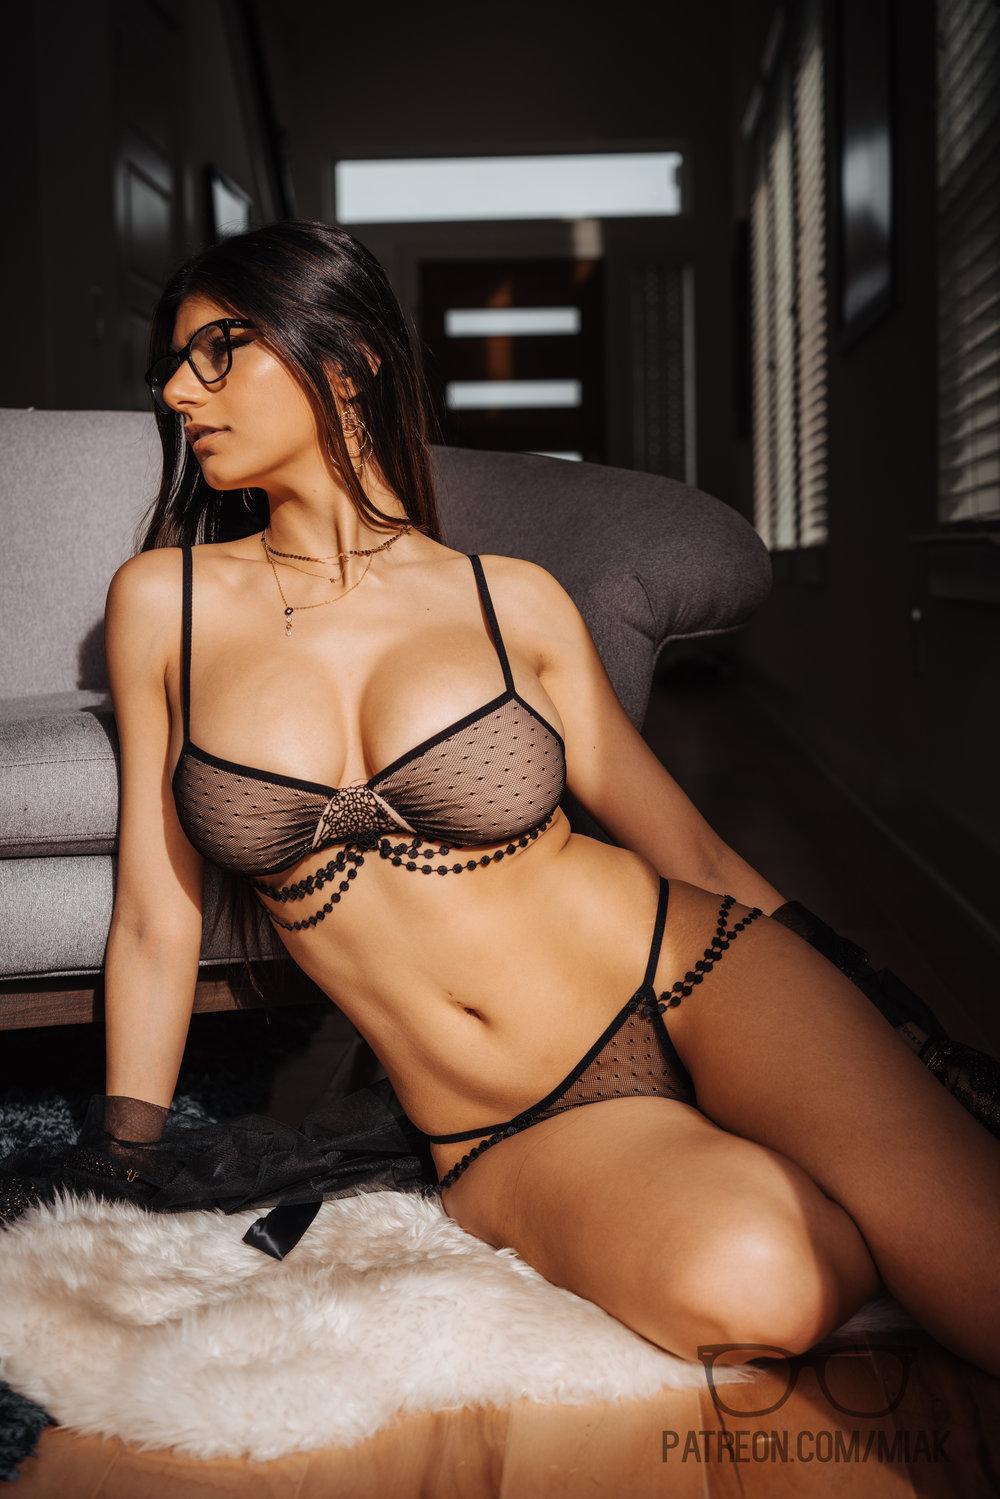 Mia Khalifa Lingerie Stiletto Heels Photoshoot Leaked 0024